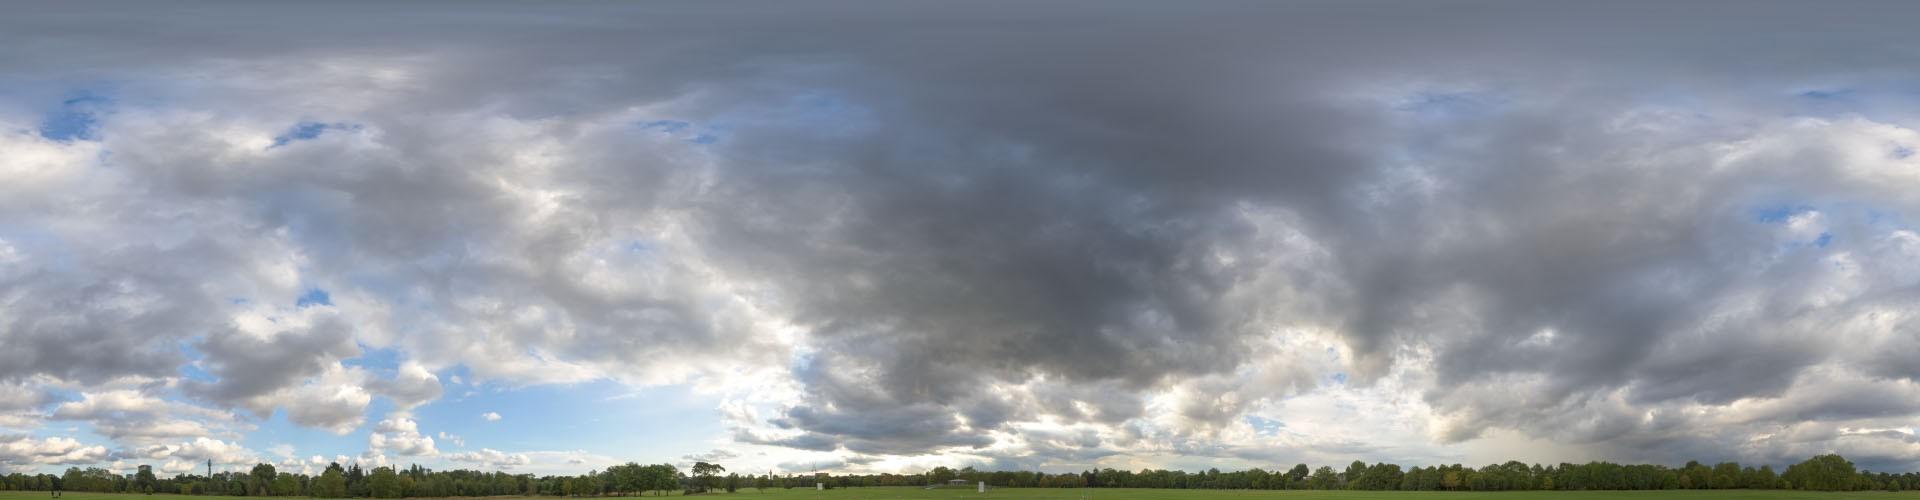 Rainy Clouds 2943 (58k)